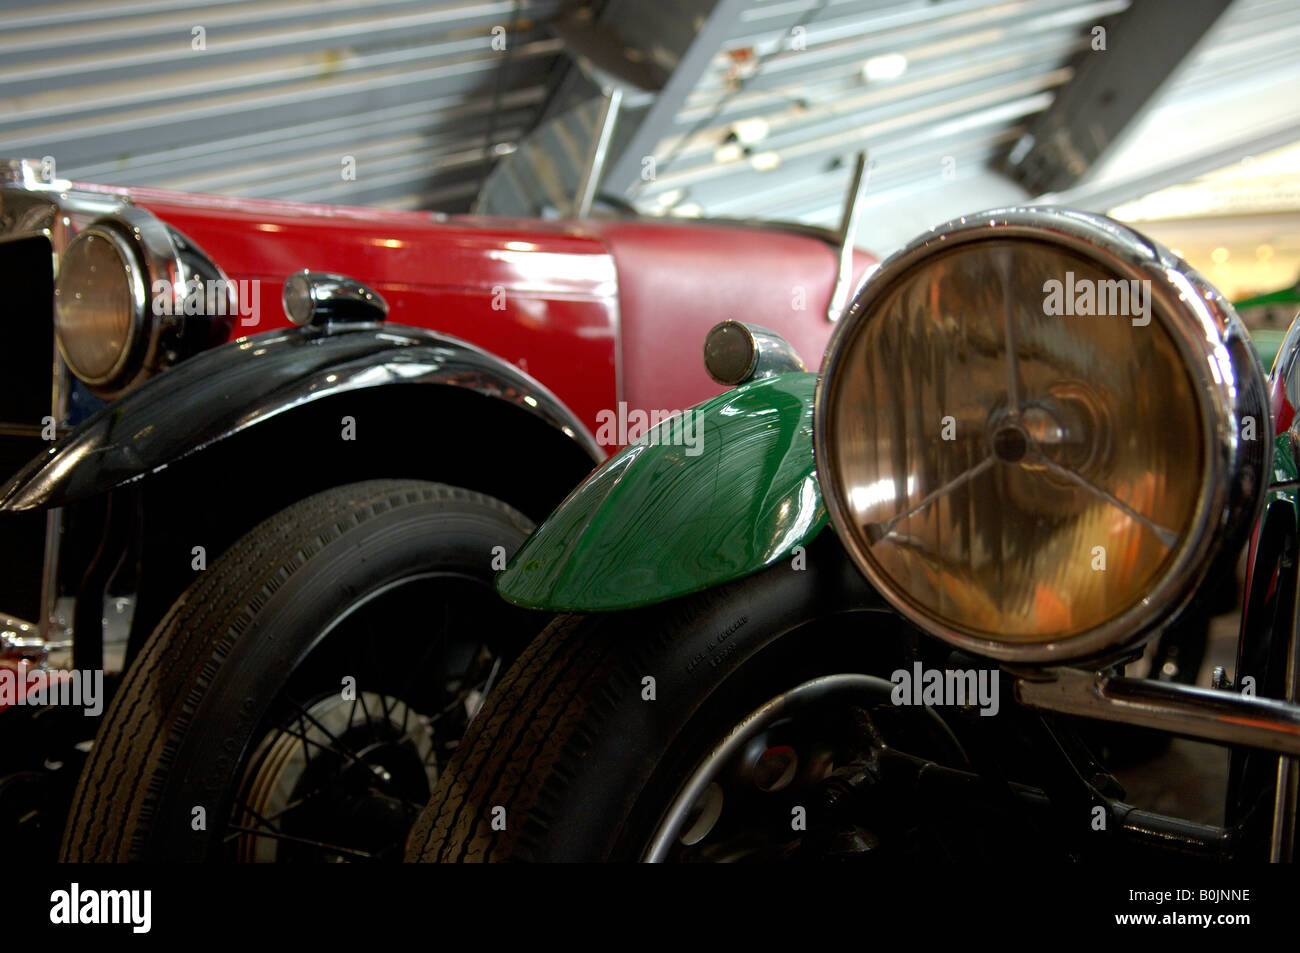 Beaulieu, New Forest, Hampshire, SO42 7ZN, Brockenhurst, Inglaterra, Reino Unido, John Montagu, Abadía, el museo del motor, James Bond, 007 autónomo Foto de stock